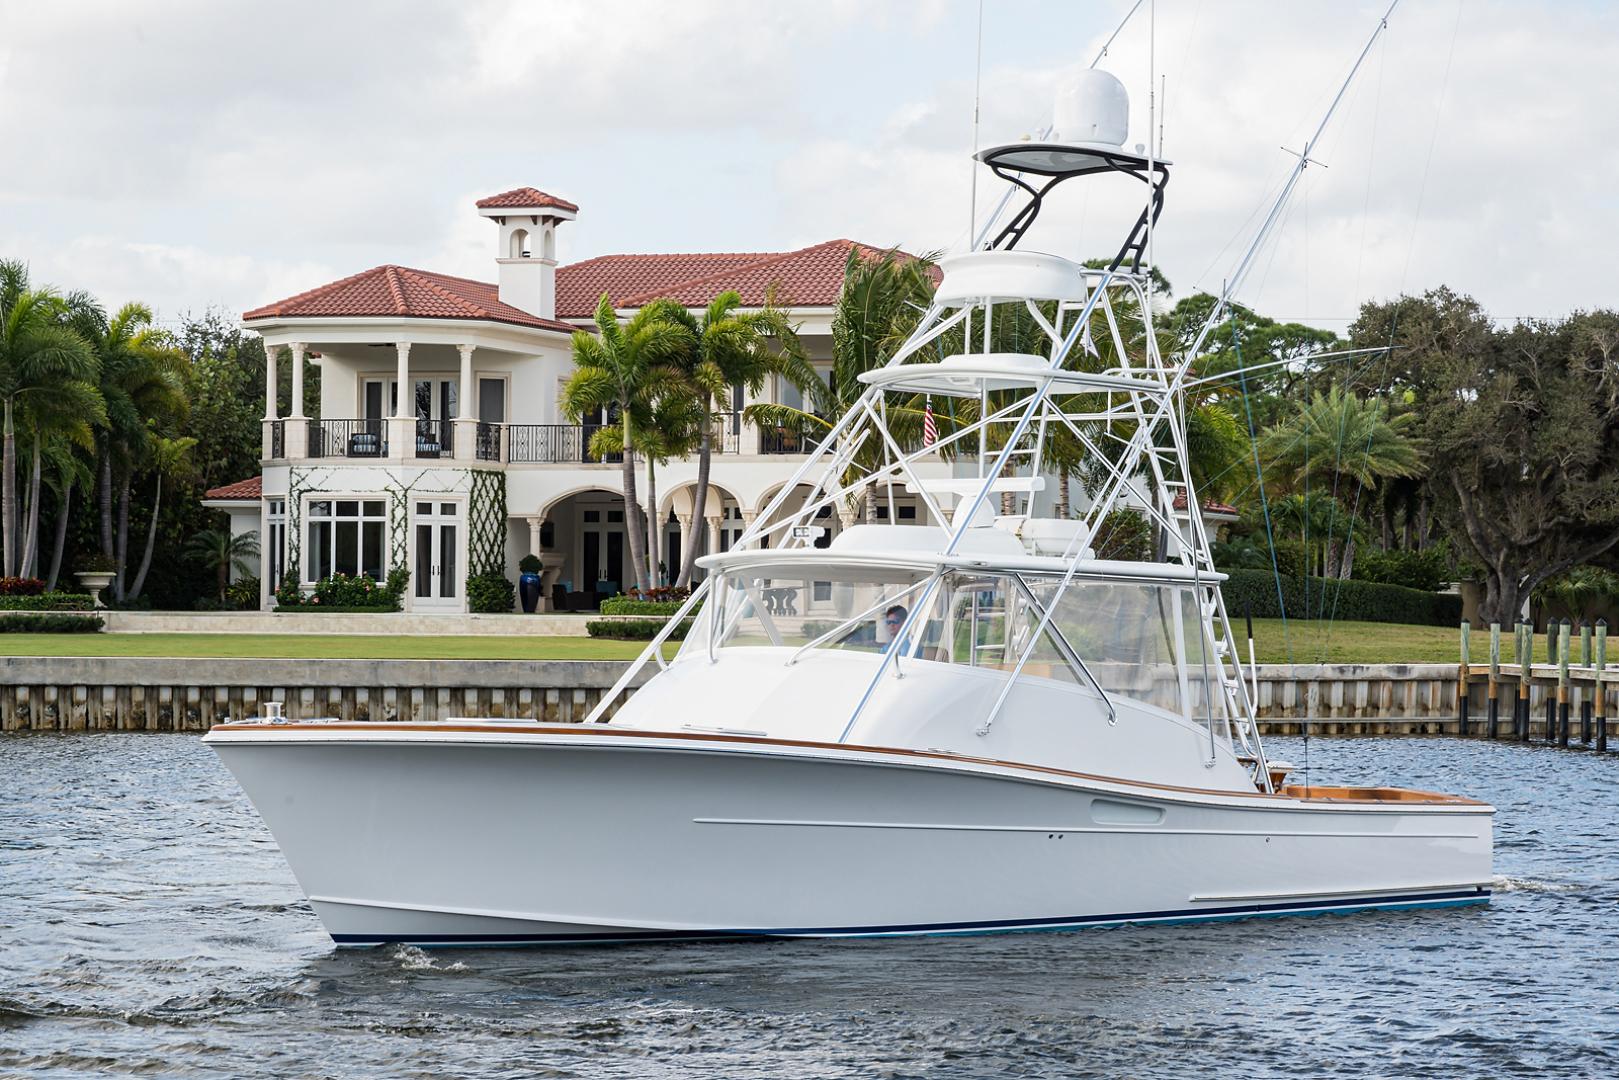 Release-One-of-A-Kind Custom Express 2014-Gladiator Jupiter-Florida-United States-Gladiator-1370140   Thumbnail